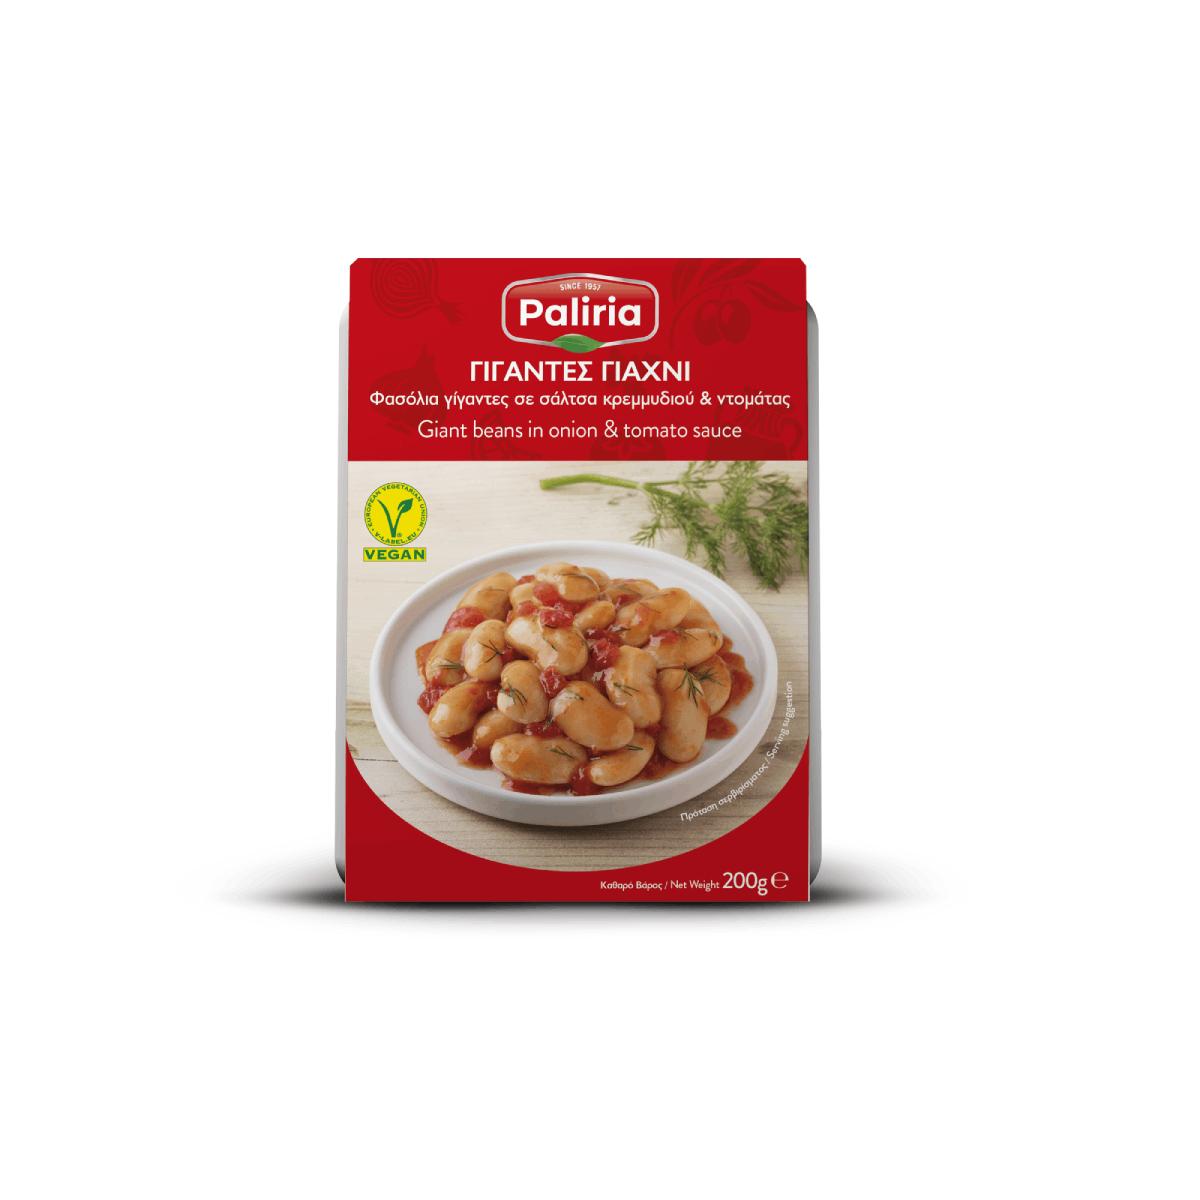 Giants Beans In Onion & Tomatoe Sauce 200g